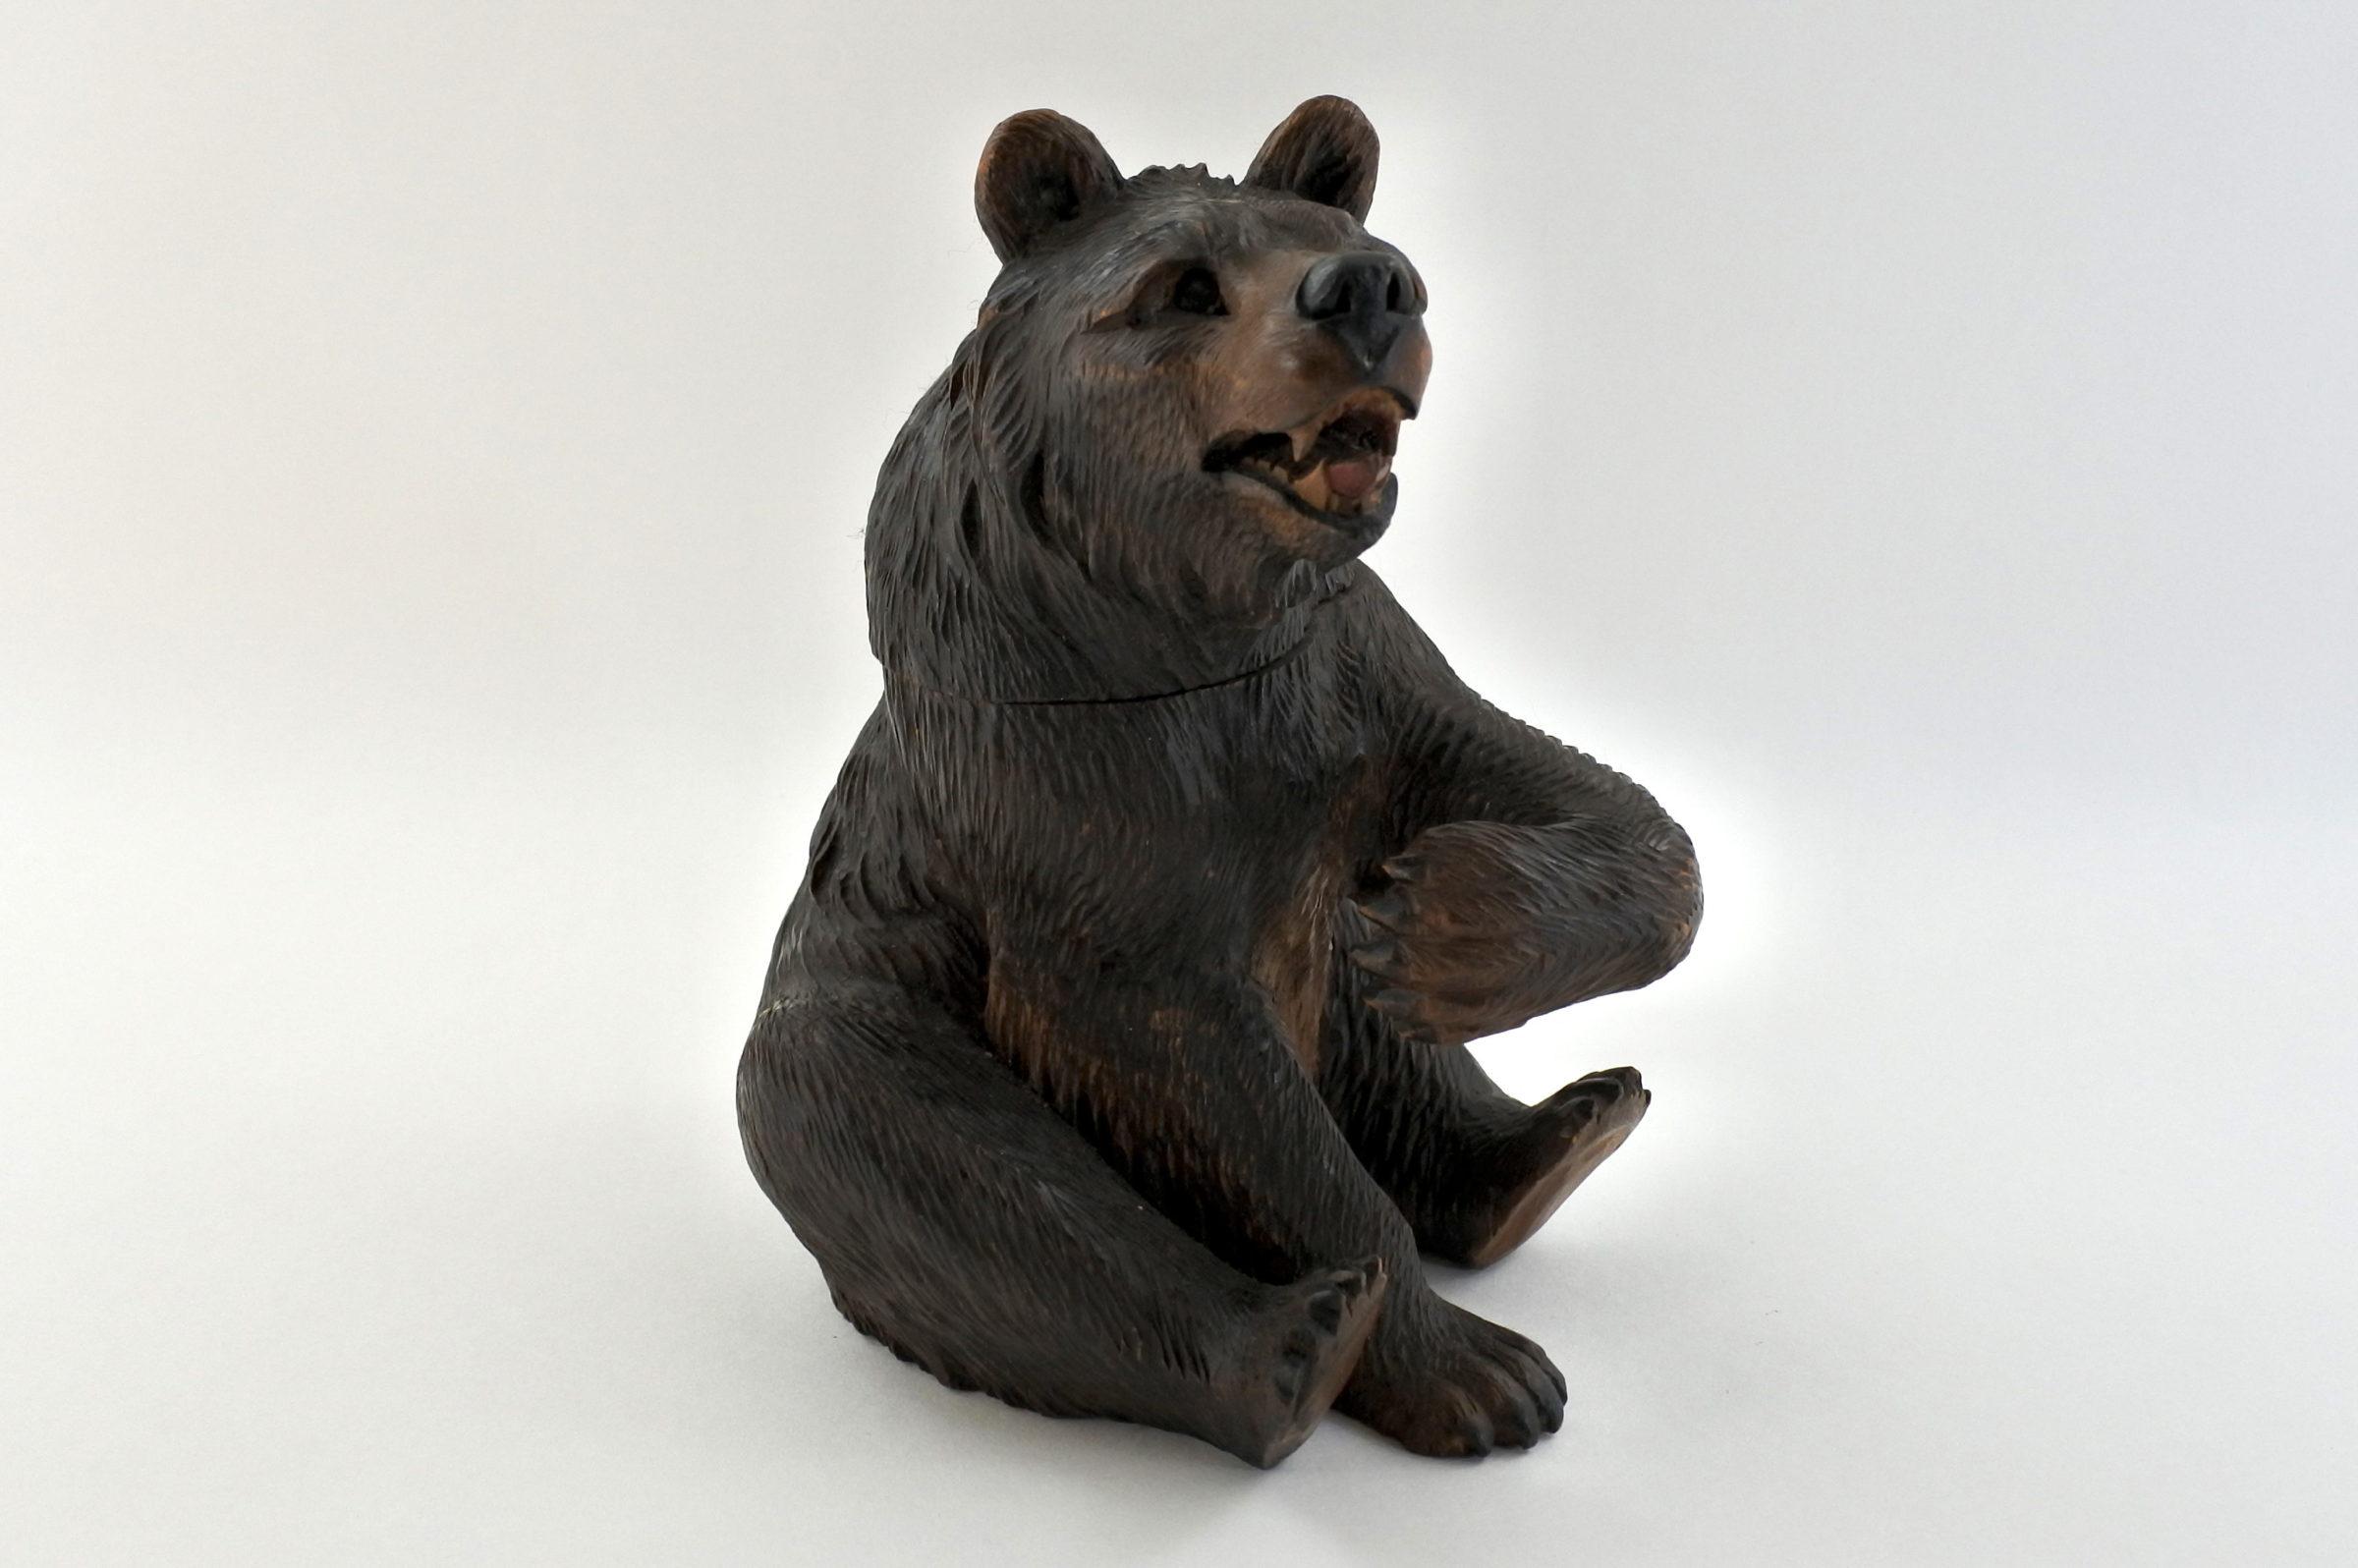 Calamaio foresta nera a forma di orso - 2